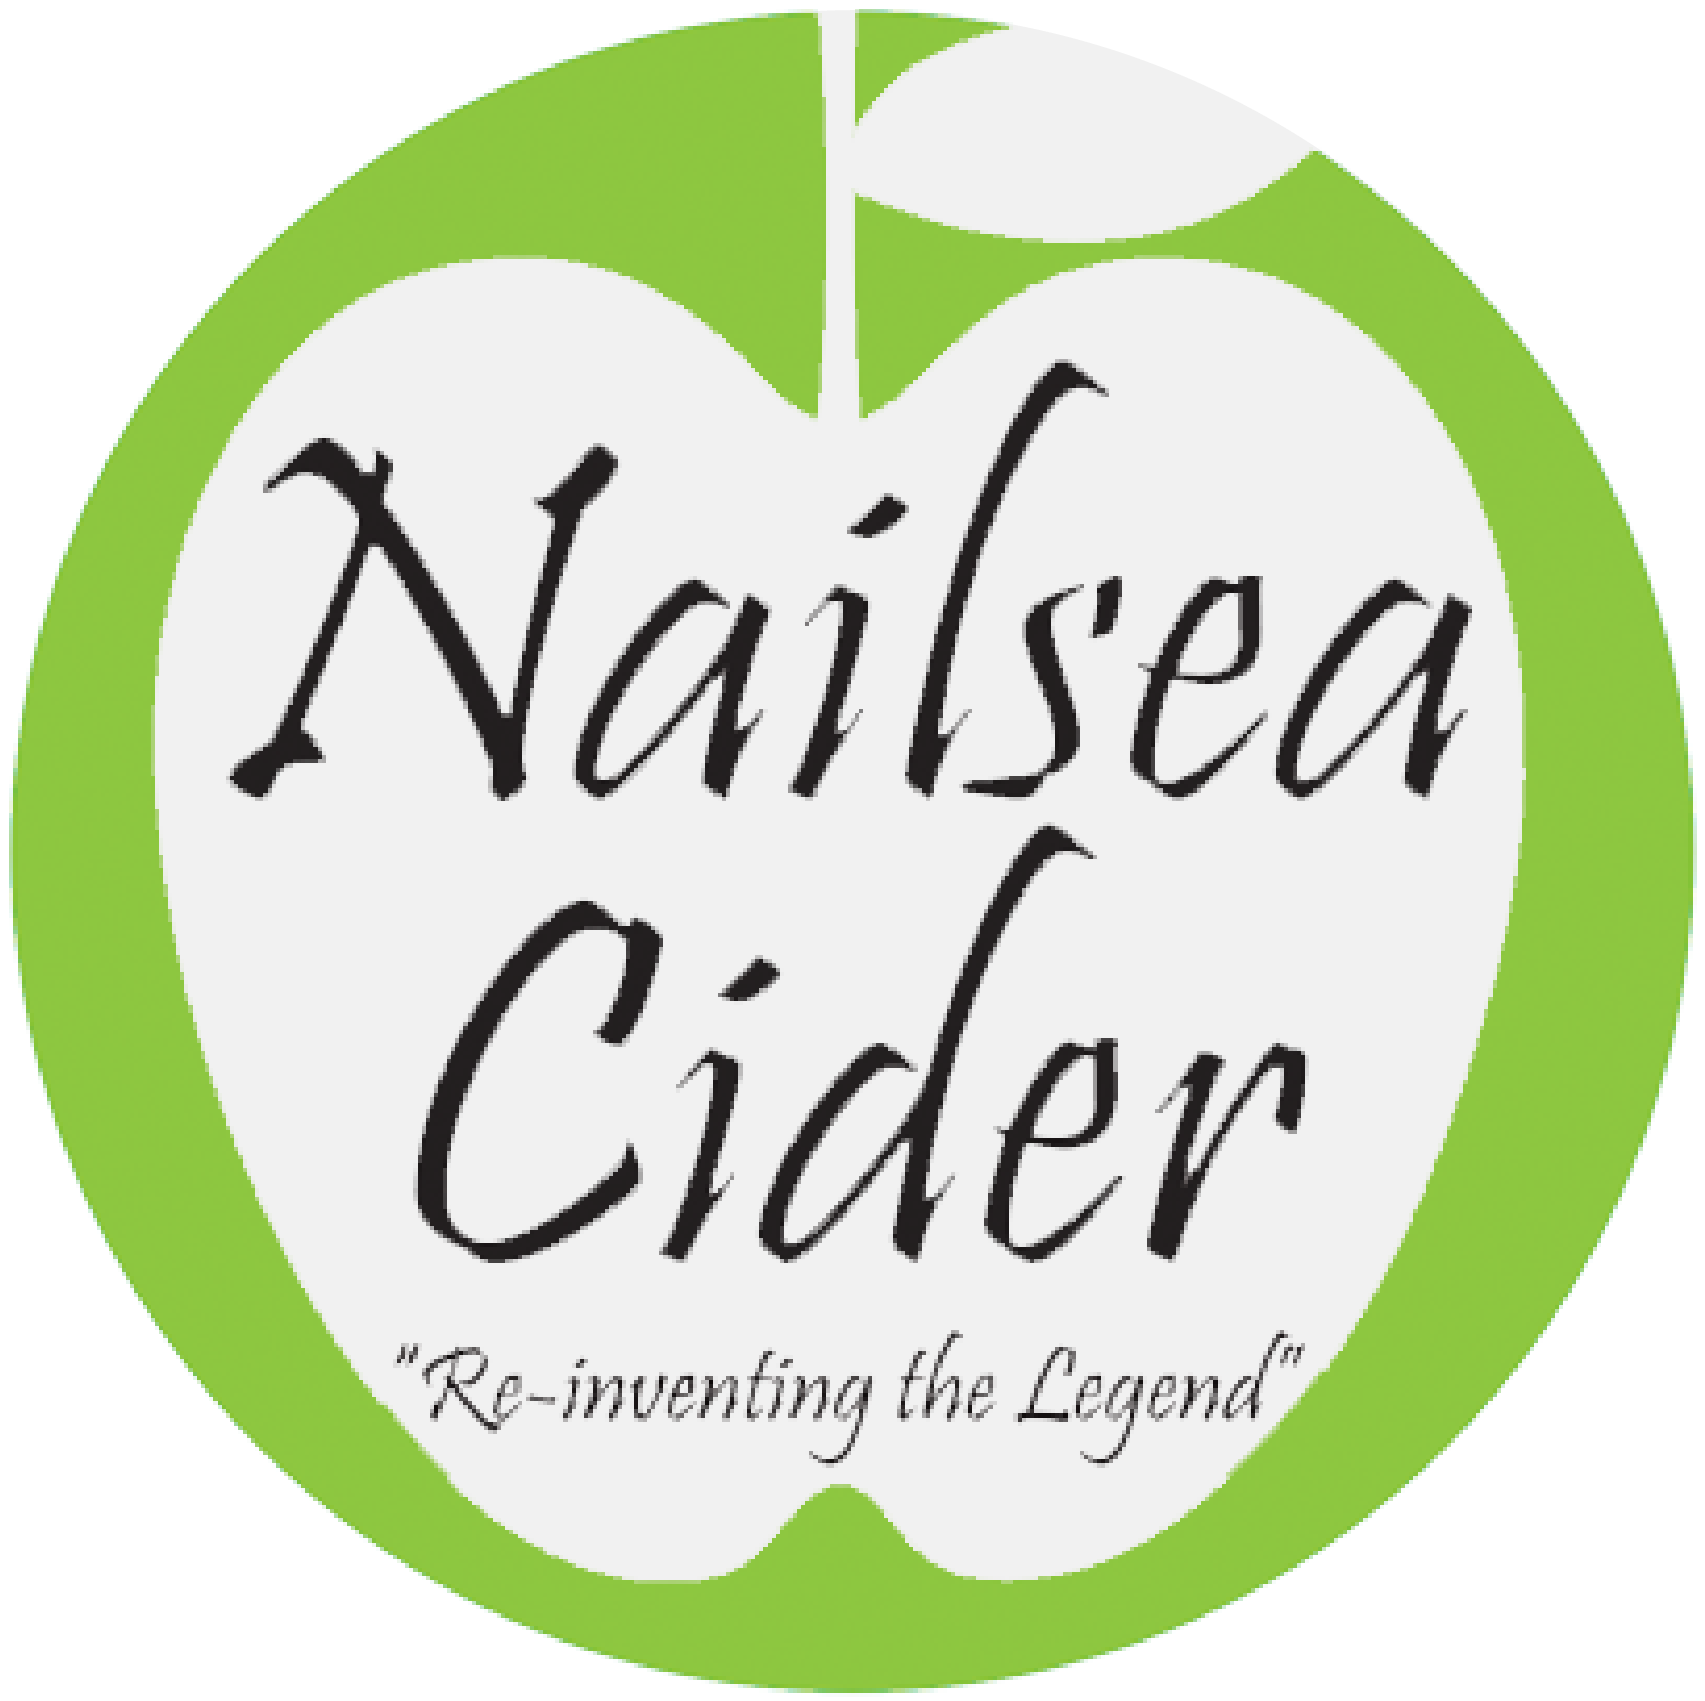 Nailsea Cider